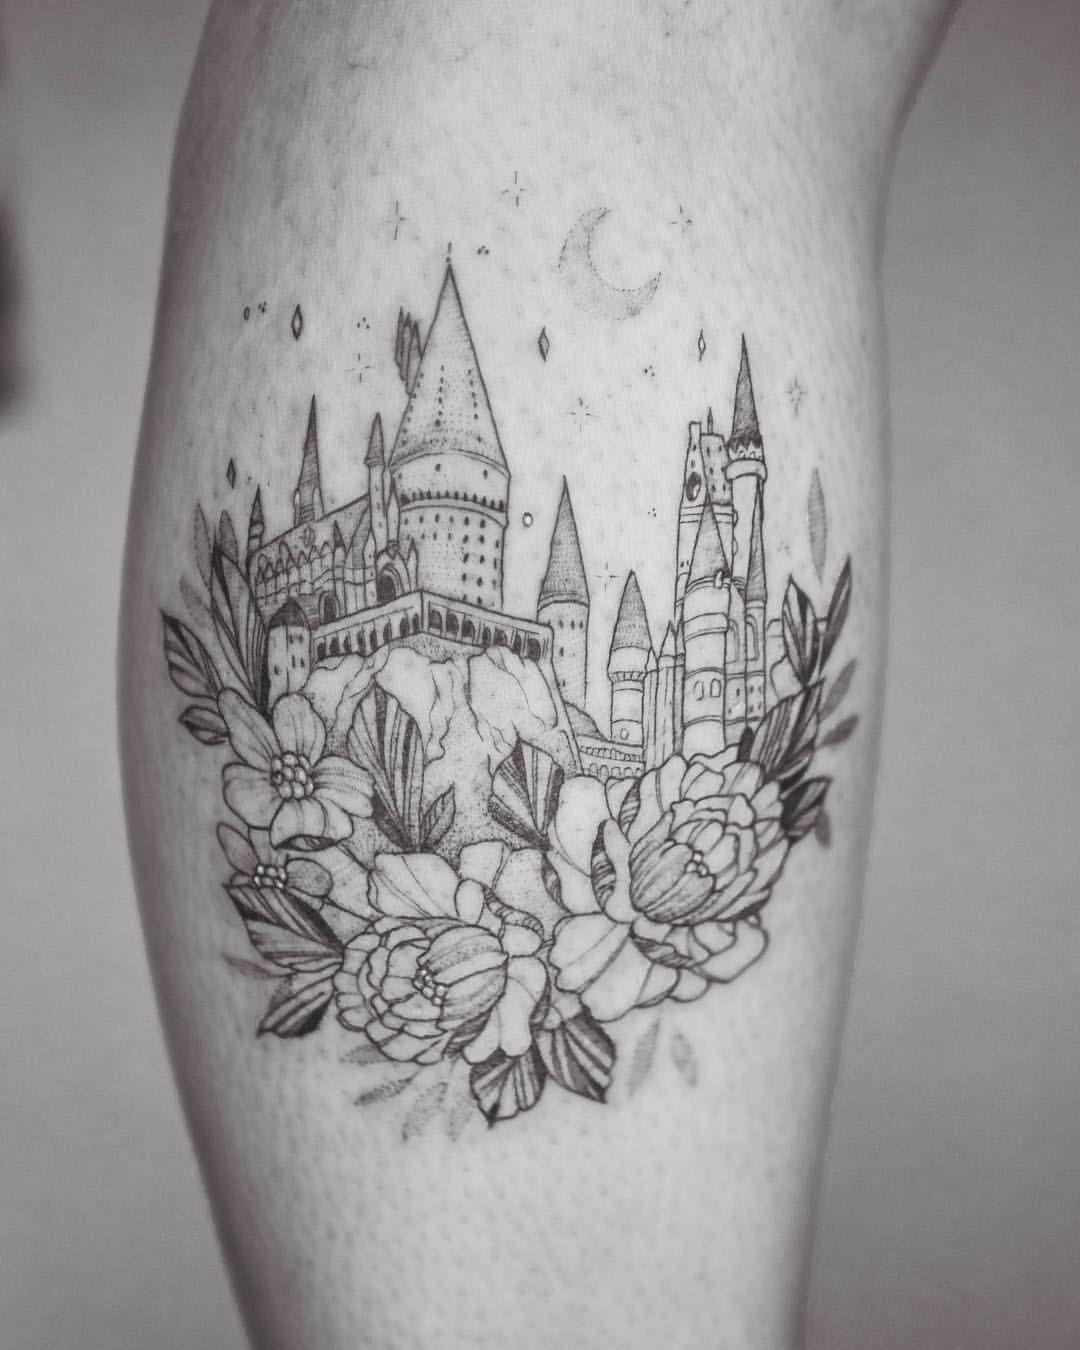 1 988 Likes 38 Comments Phoebe Hunter Phoebej Tattoos On Instagram Hogwarts Castle Done For A Hogwarts Tattoo Harry Potter Tattoo Harry Potter Tattoos